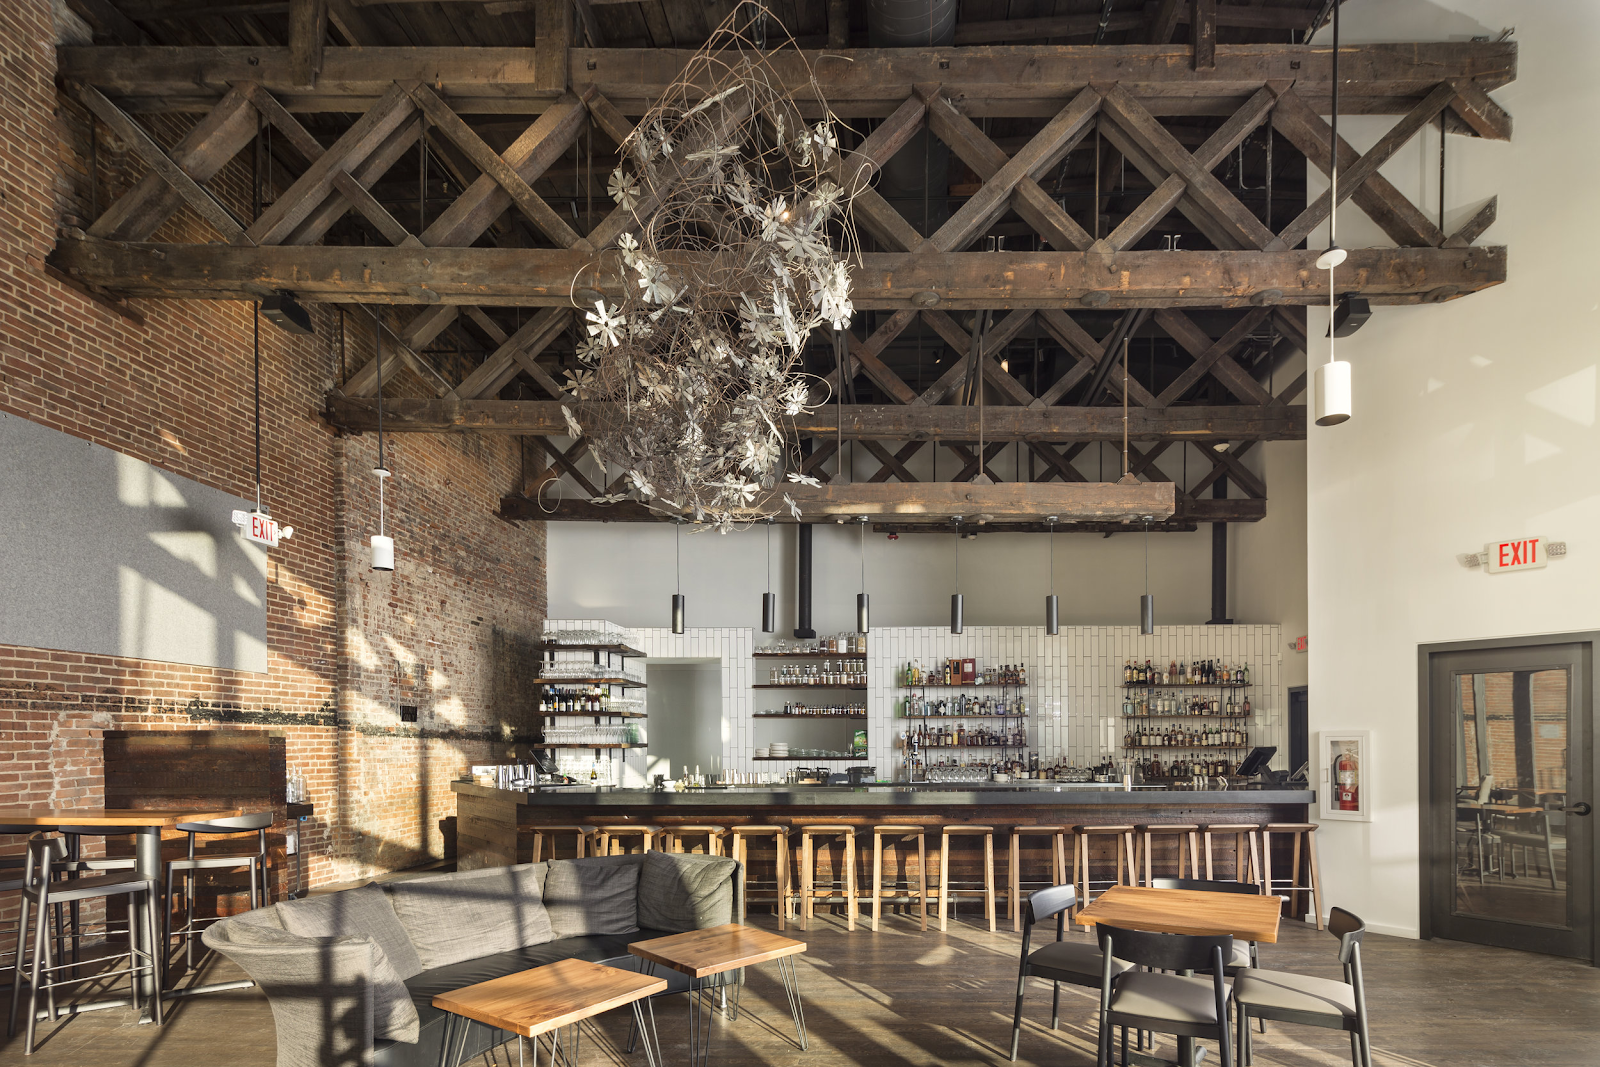 Aster bar upscale interior